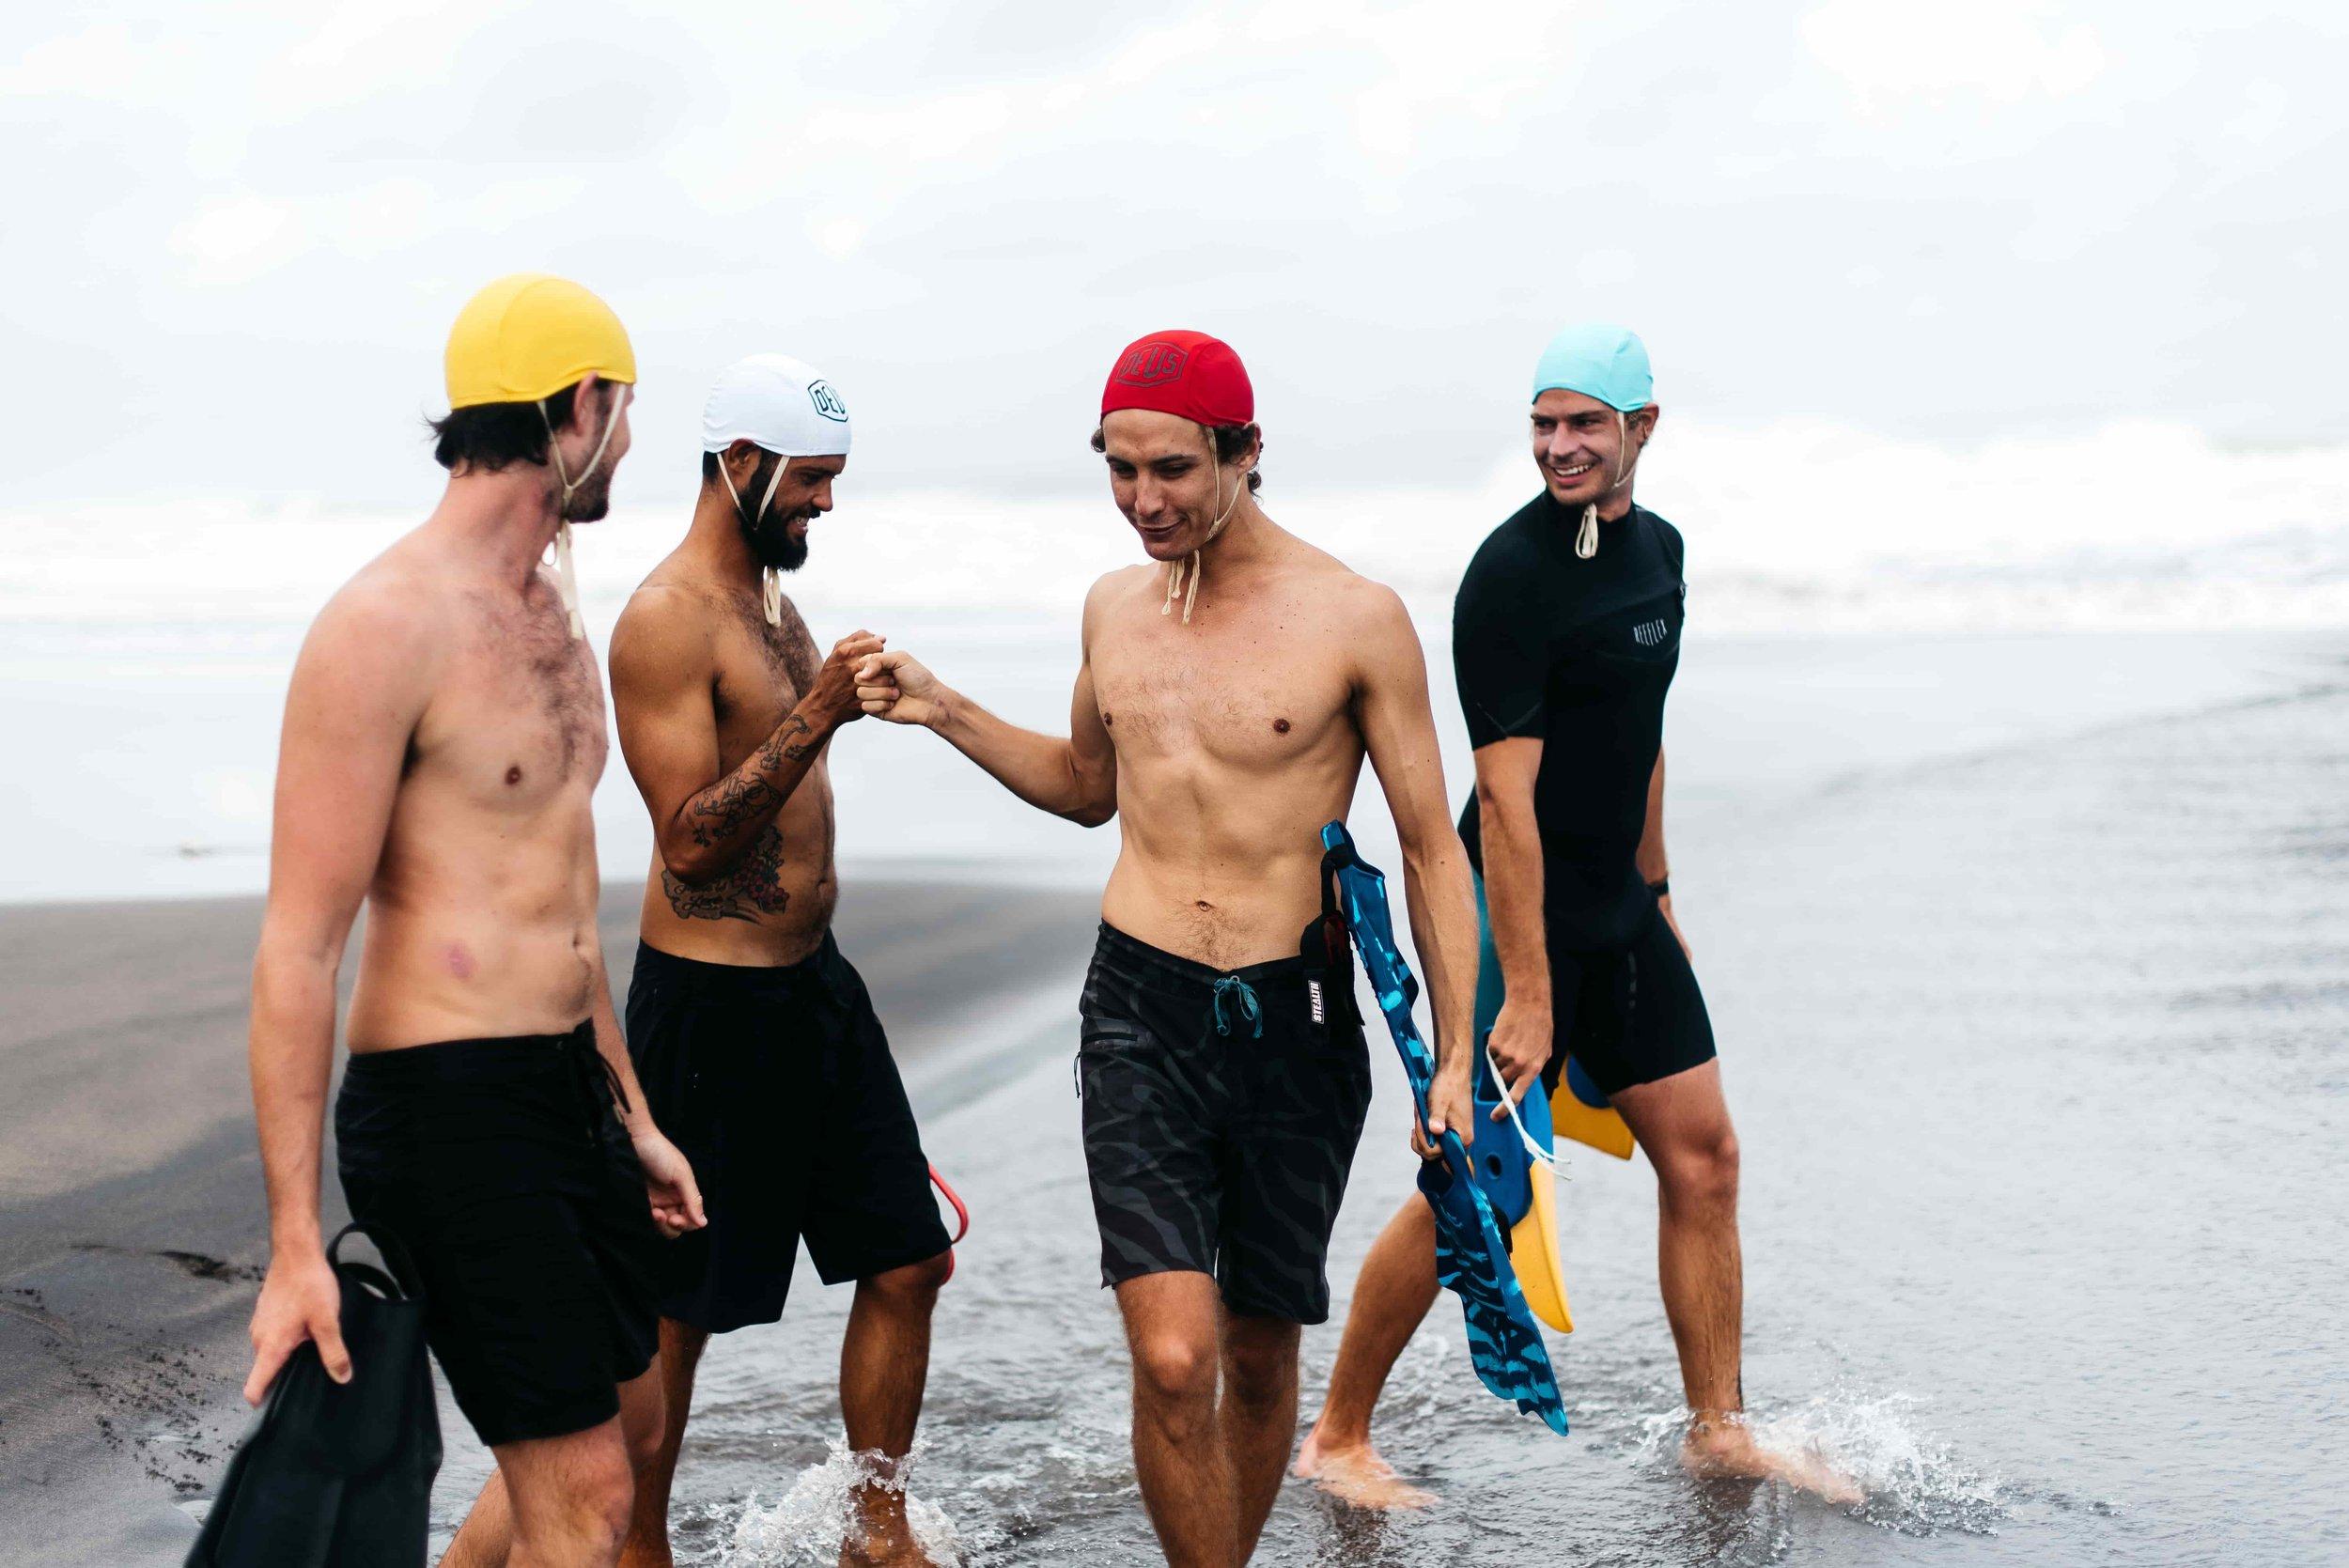 Jack Macrae body surfer deus